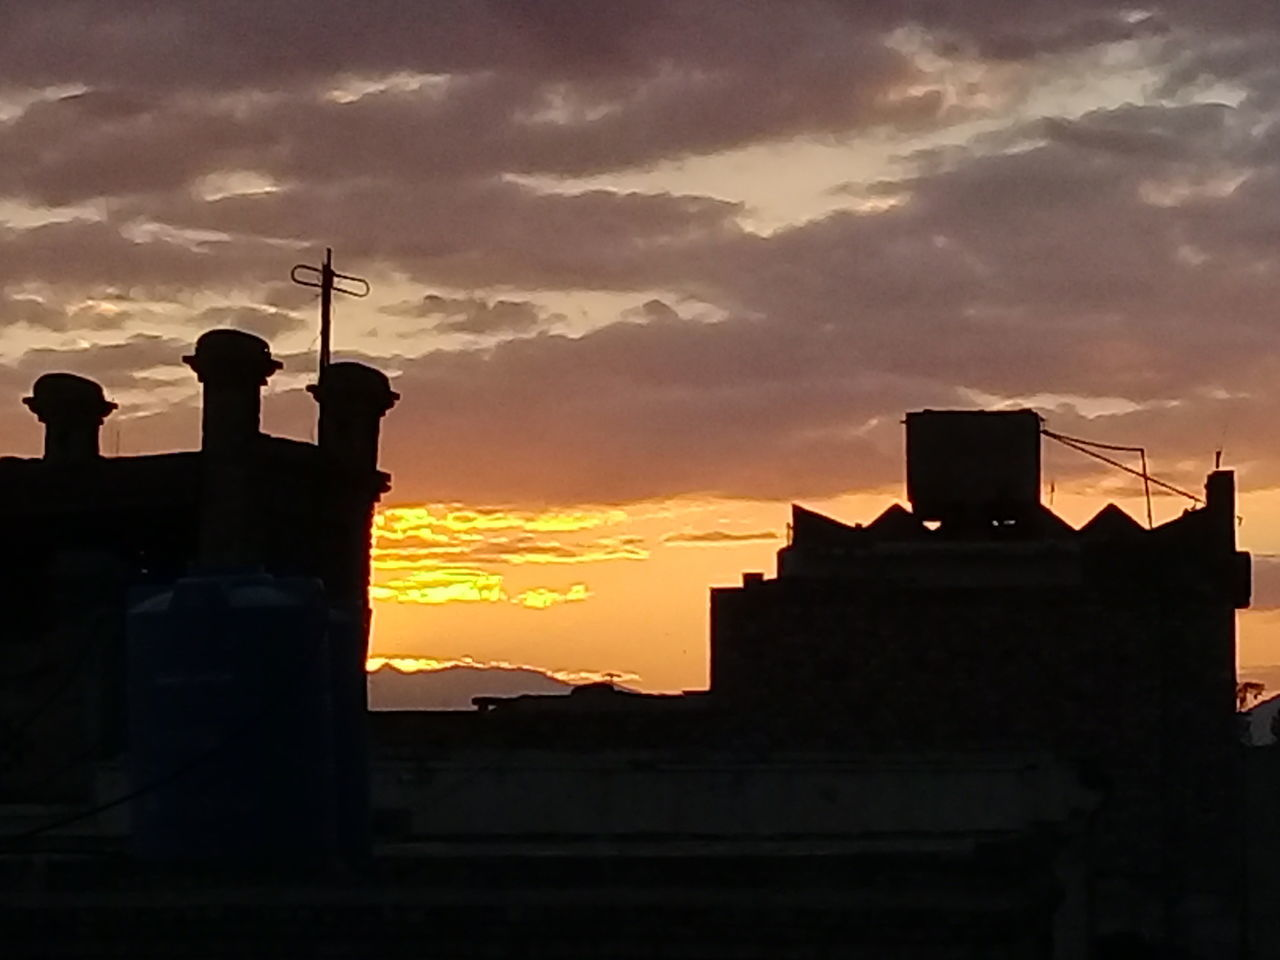 sunset, orange color, architecture, sky, cloud - sky, built structure, building exterior, silhouette, no people, outdoors, nature